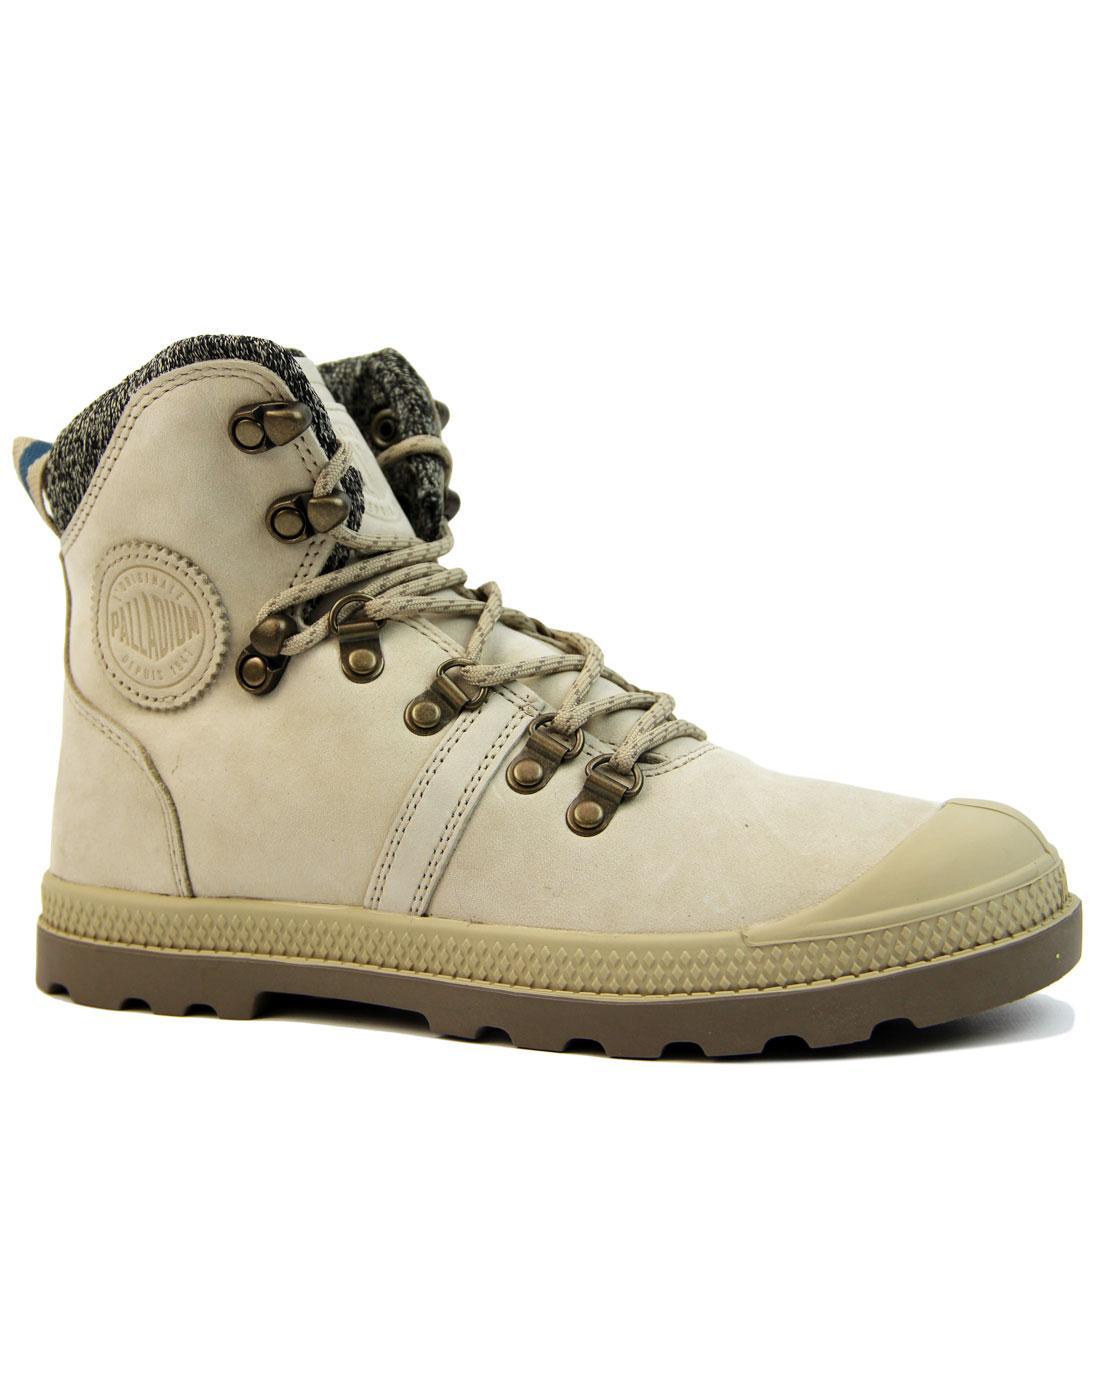 Pallabrouse Hiker PALLADIUM Retro 70s Boots (S/B)